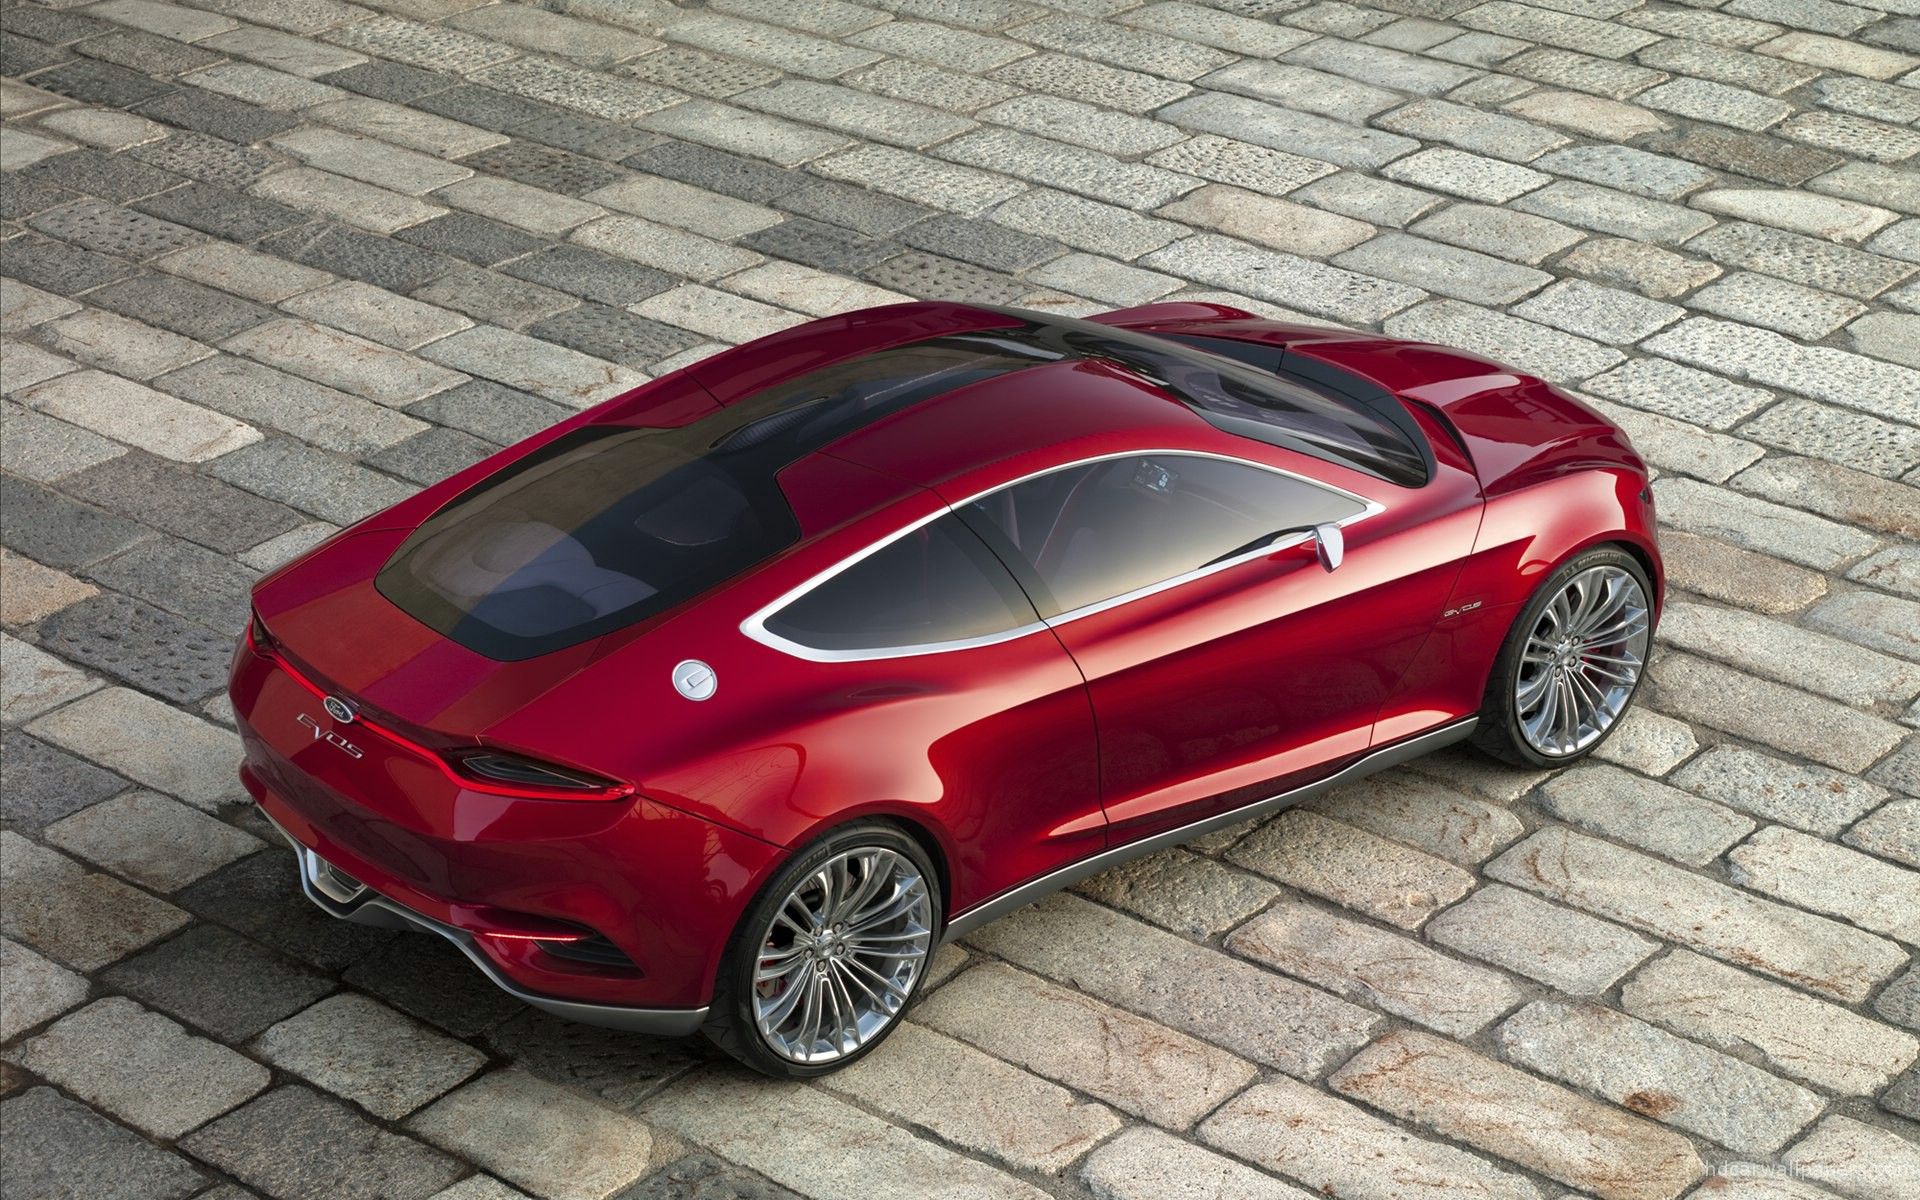 2012 Ford Evos Concept 2 Wallpaper | HD Car Wallpapers